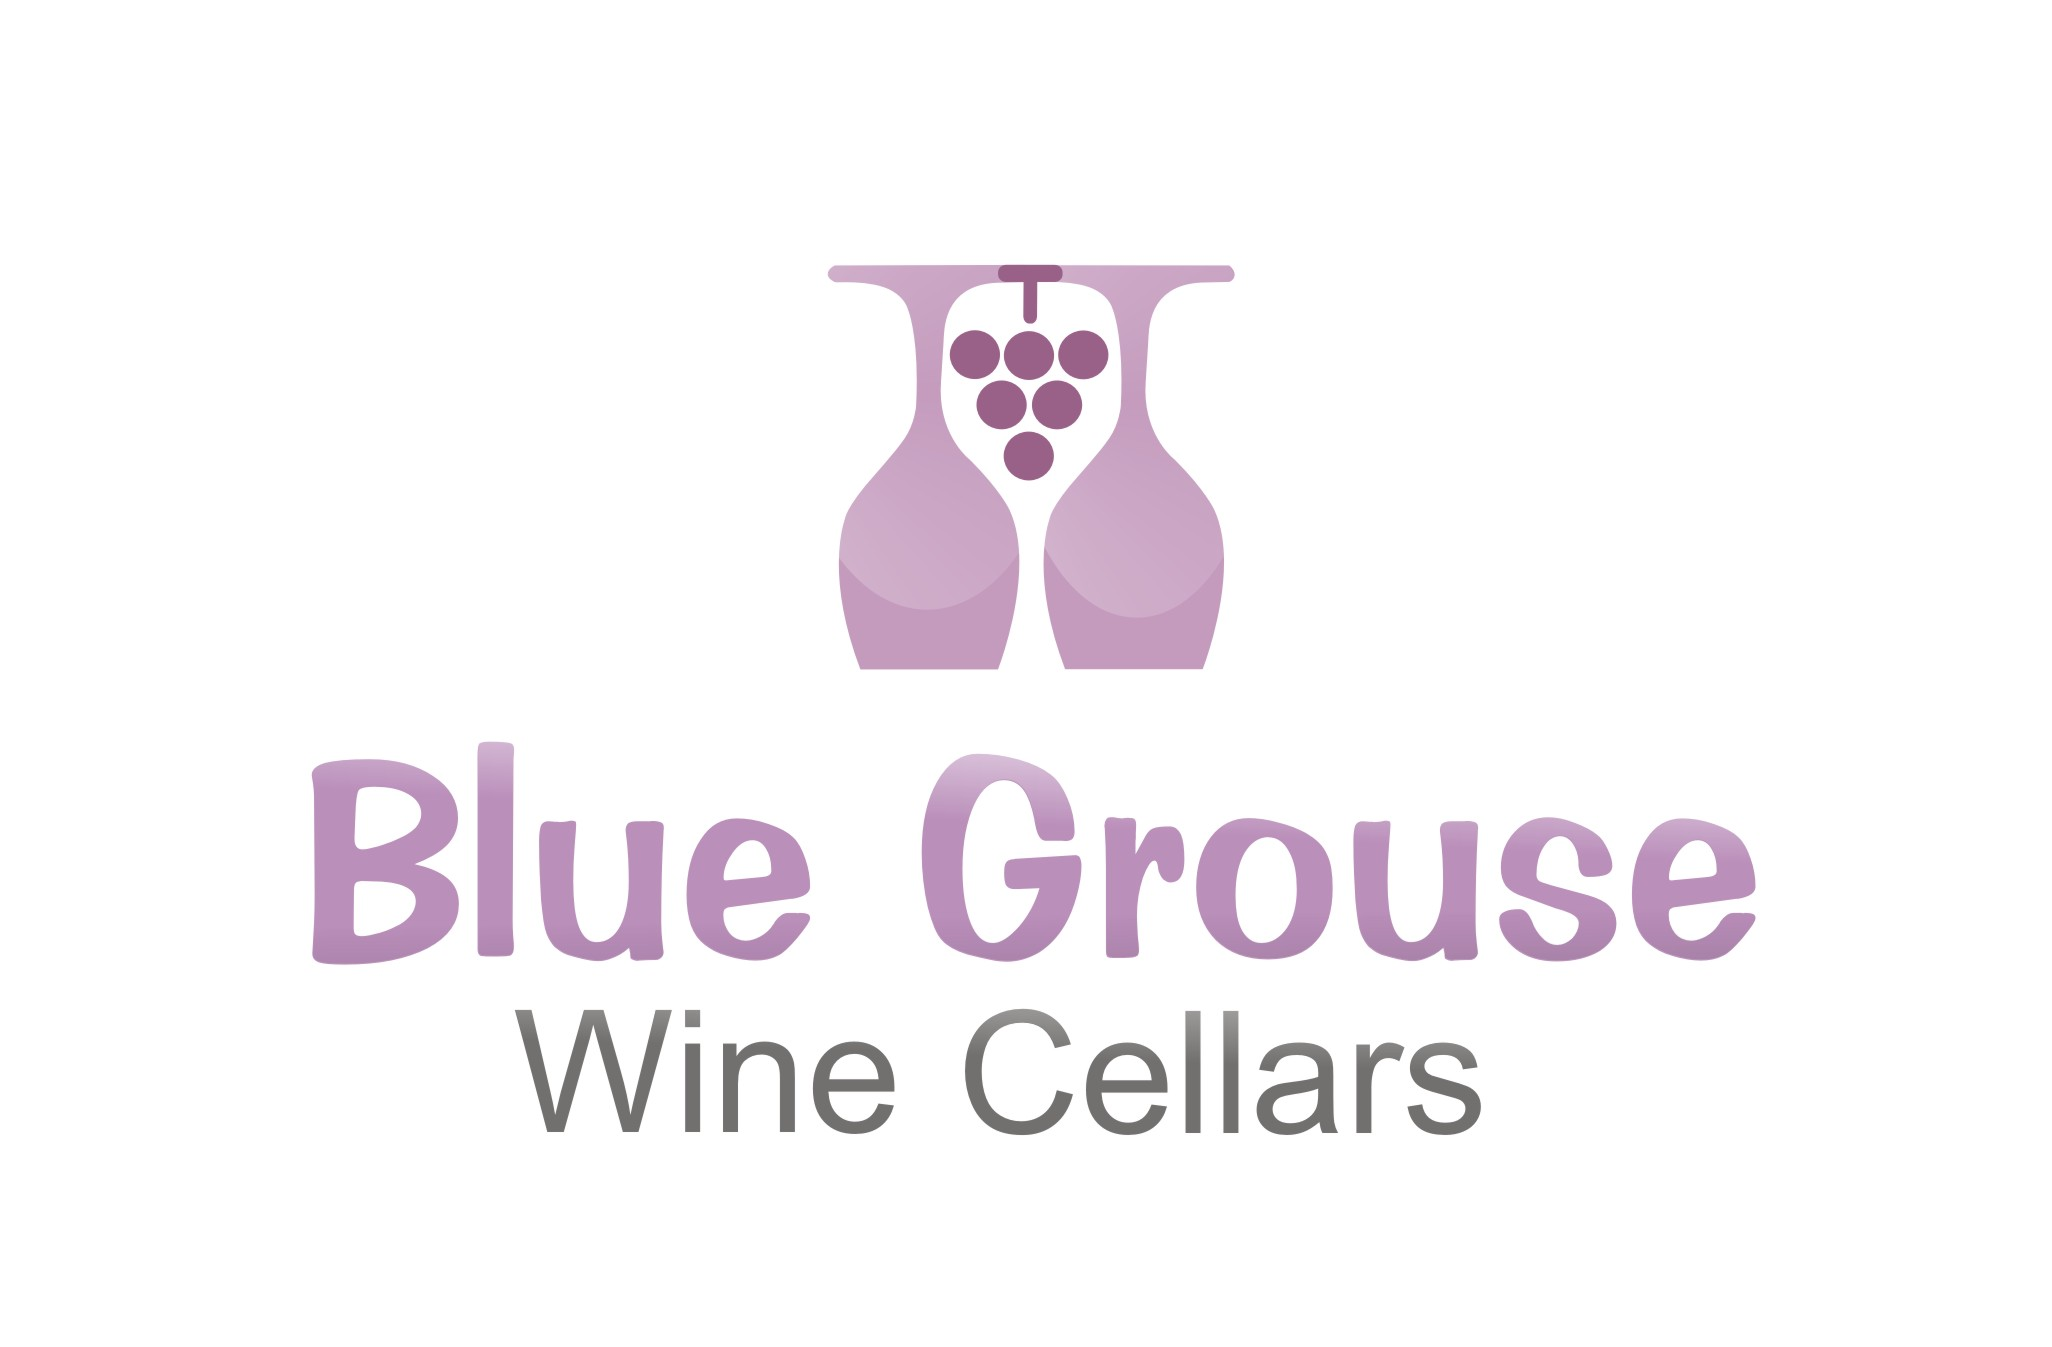 Logo Design by Shailender Kumar - Entry No. 264 in the Logo Design Contest Creative Logo Design for Blue Grouse Wine Cellars.